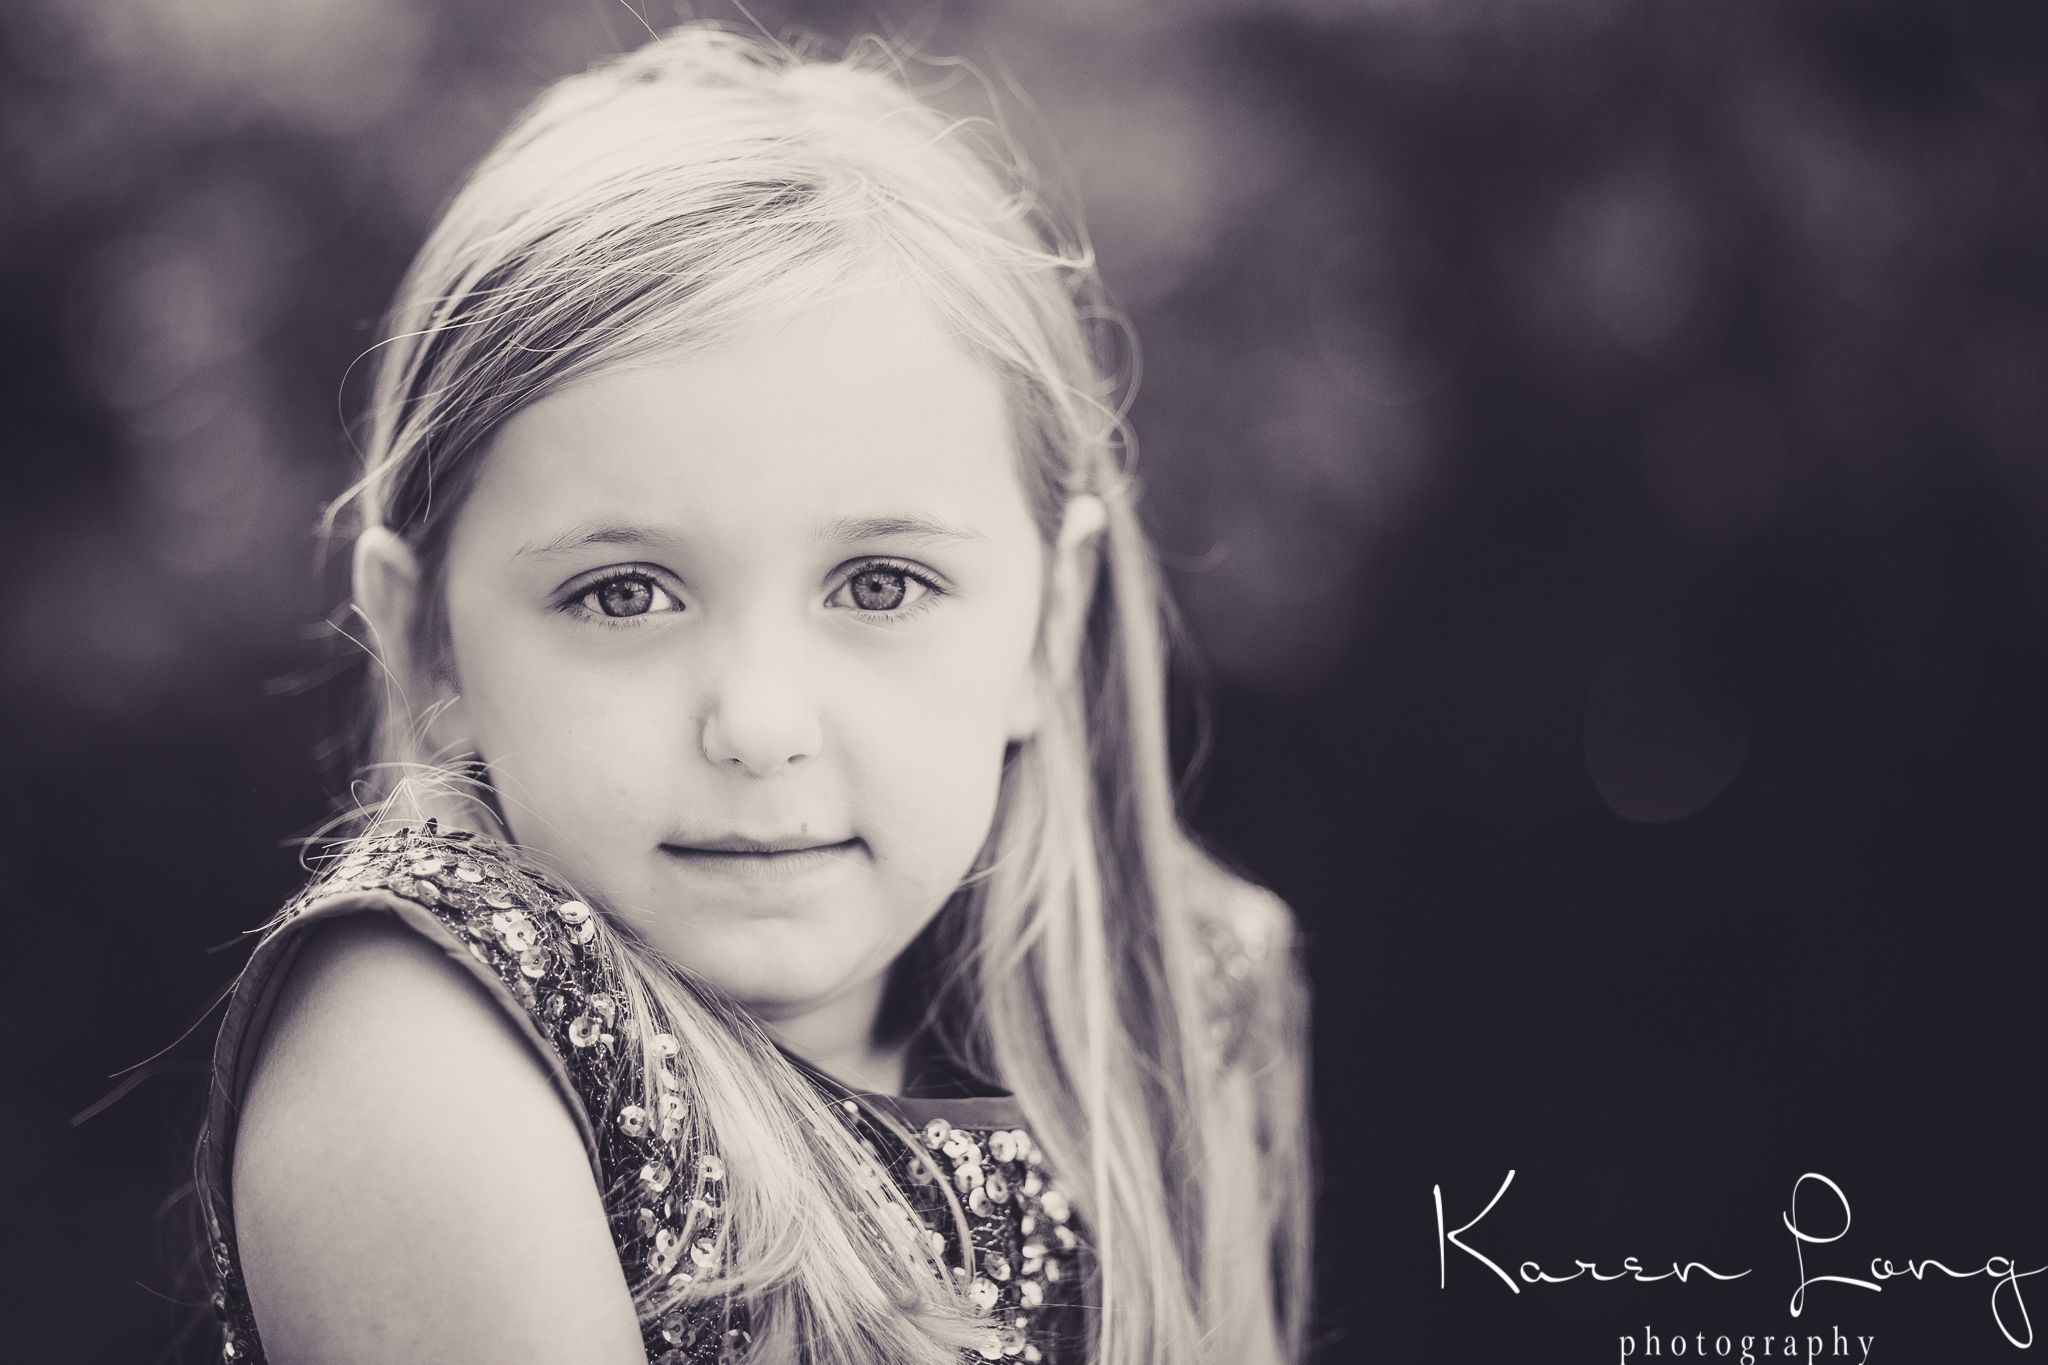 Megan by karenlongphotography